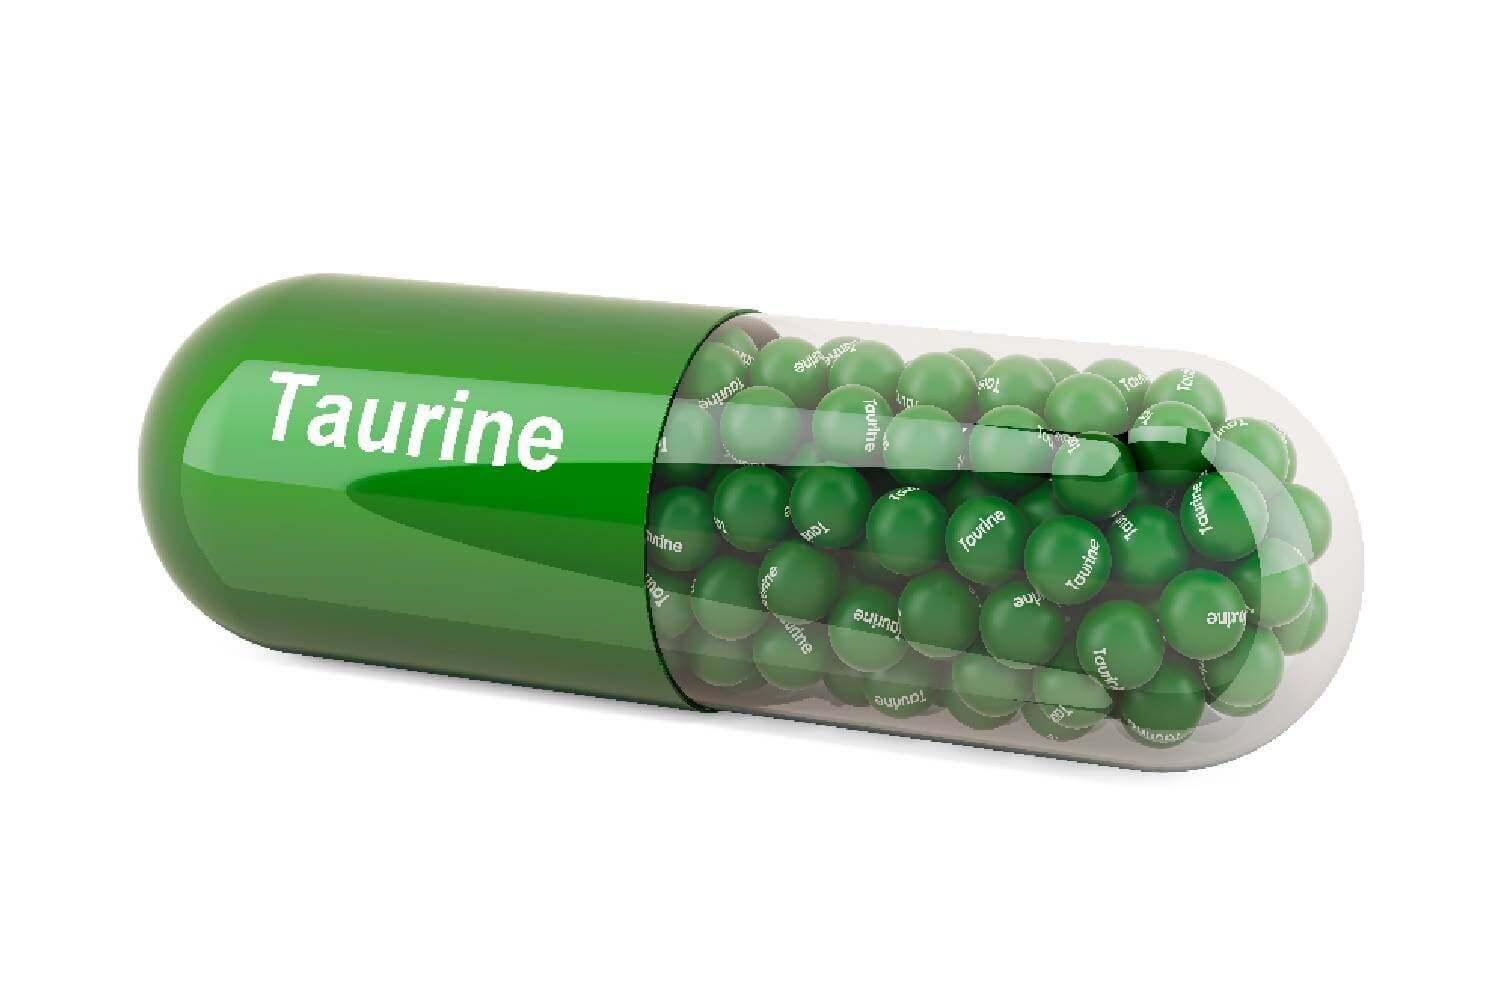 image de l'ingredient Taurine